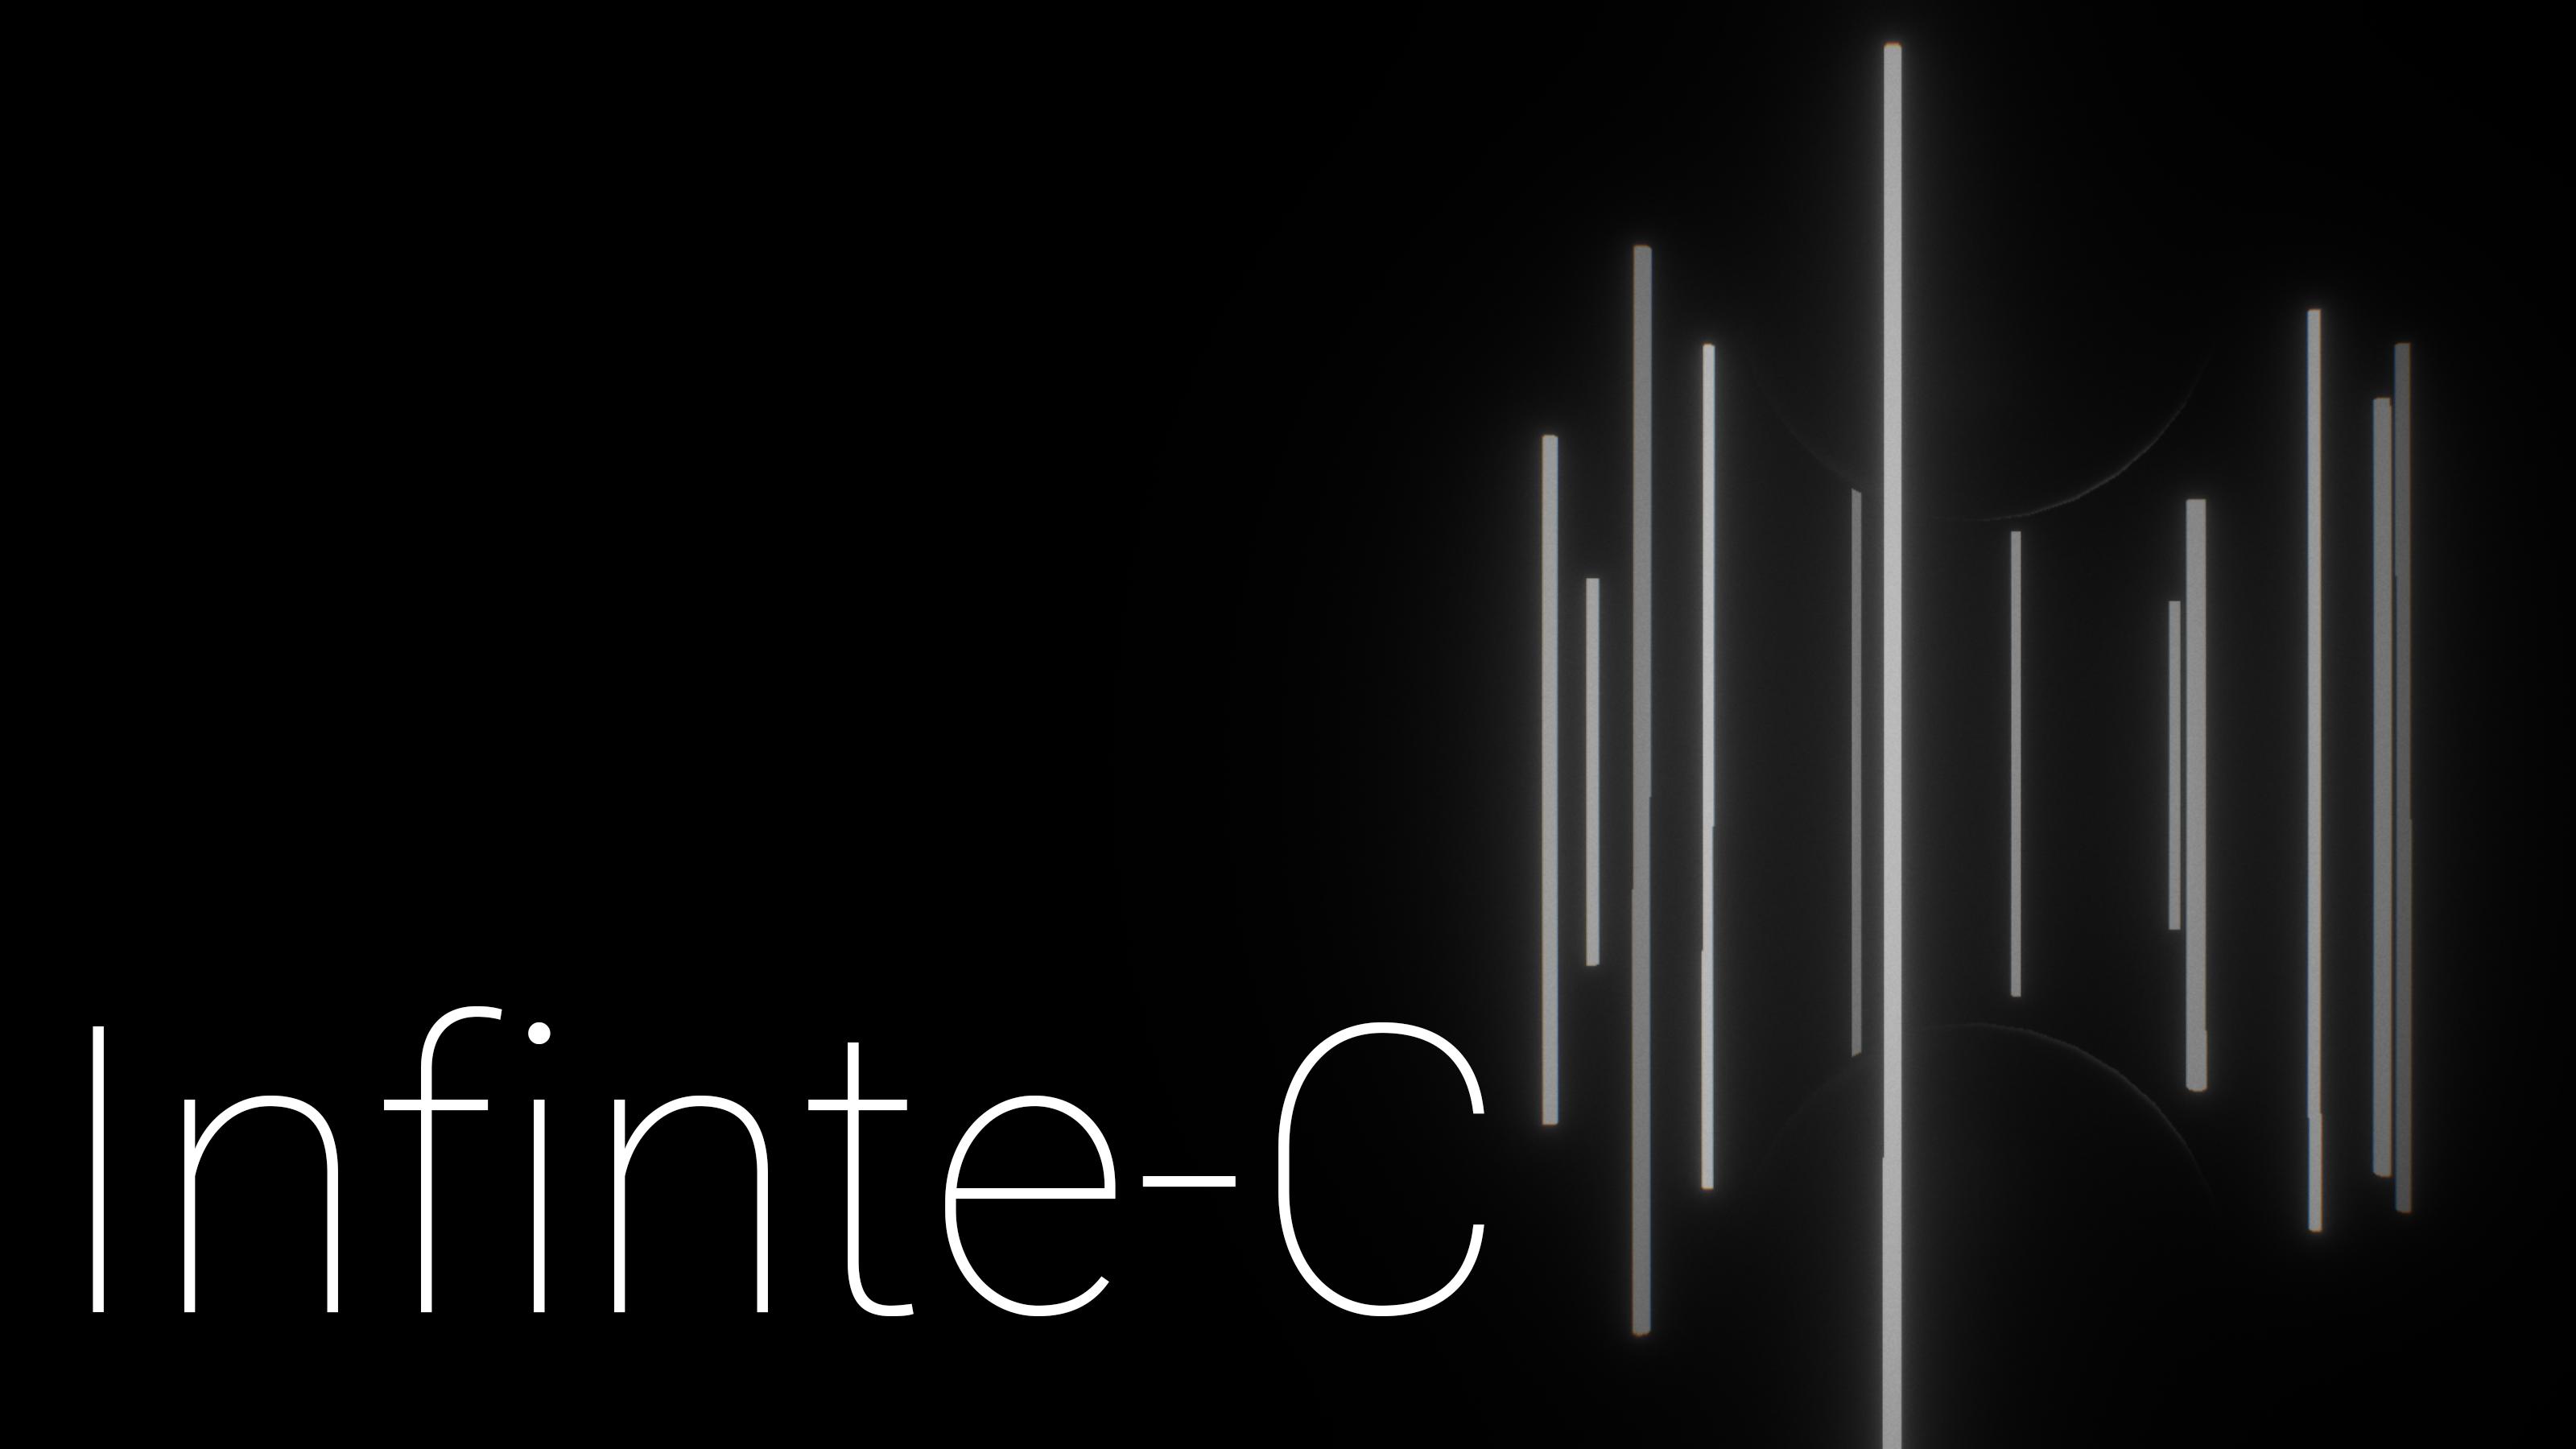 Infinite-C